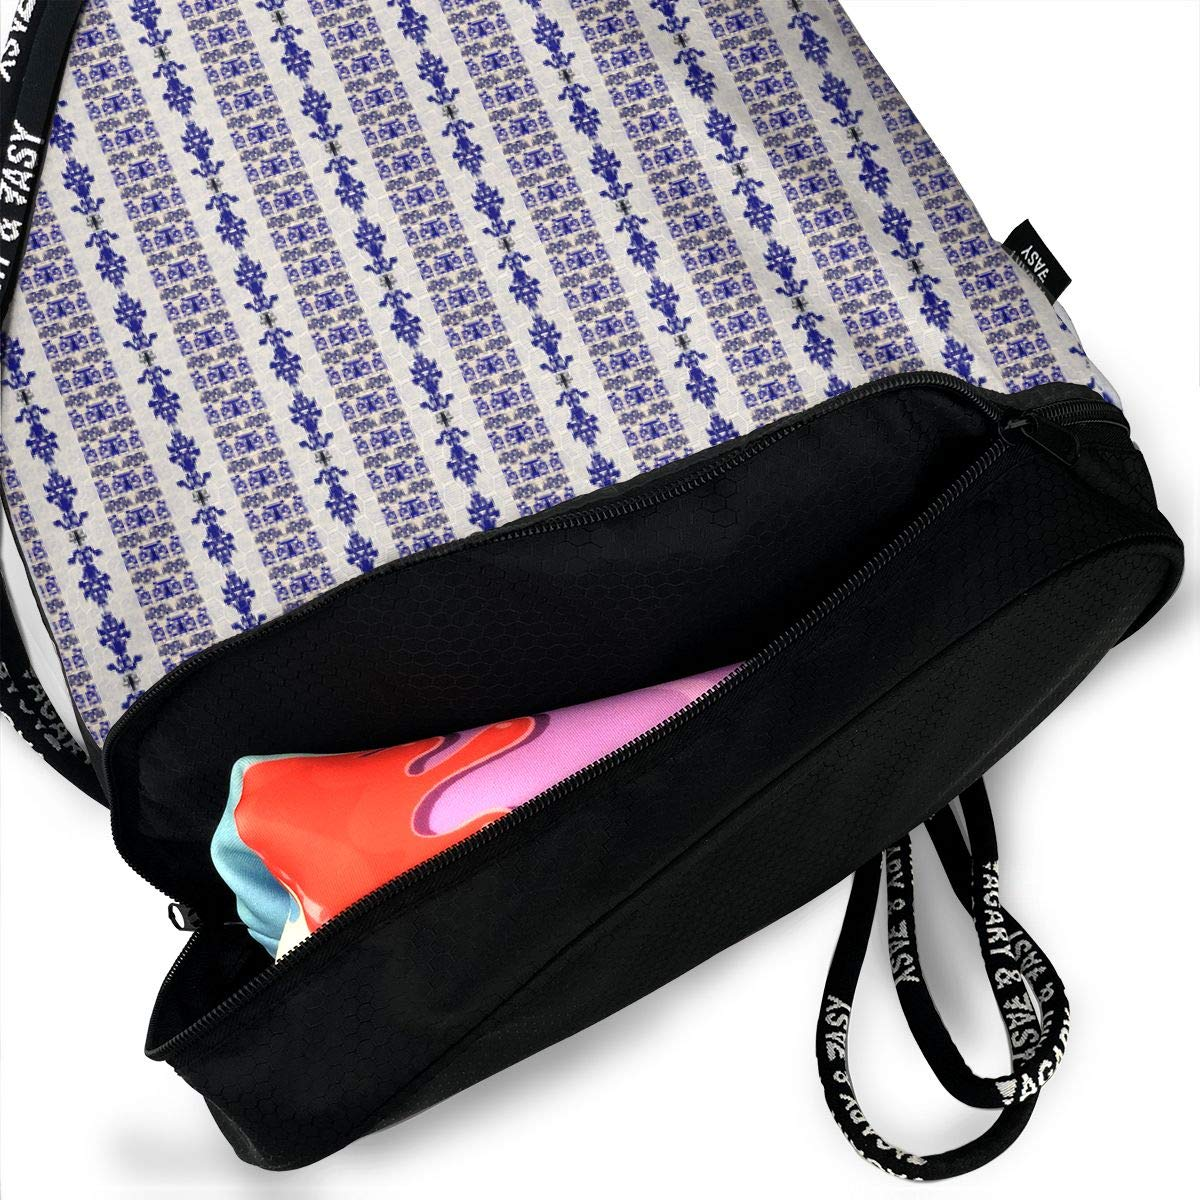 Stacyck Studio Purple Cream Damask Stripes Drawstring Backpack Sports Athletic Gym Cinch Sack String Storage Bags for Hiking Travel Beach